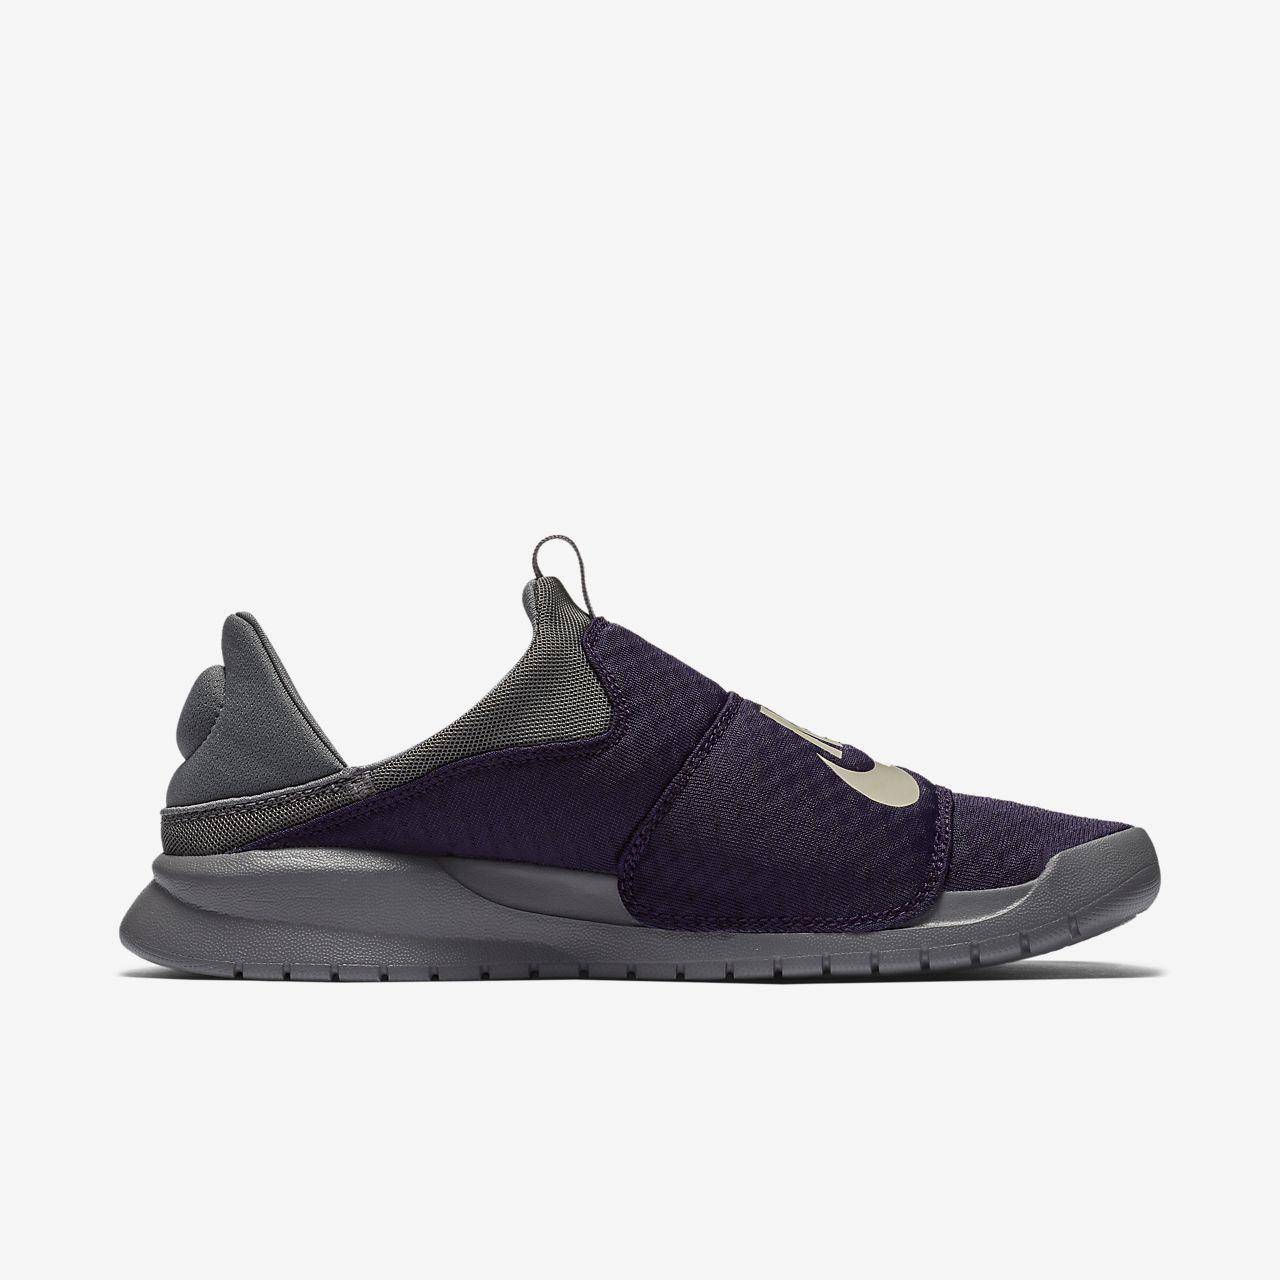 ... Nike Benassi Slip Unisex Shoe